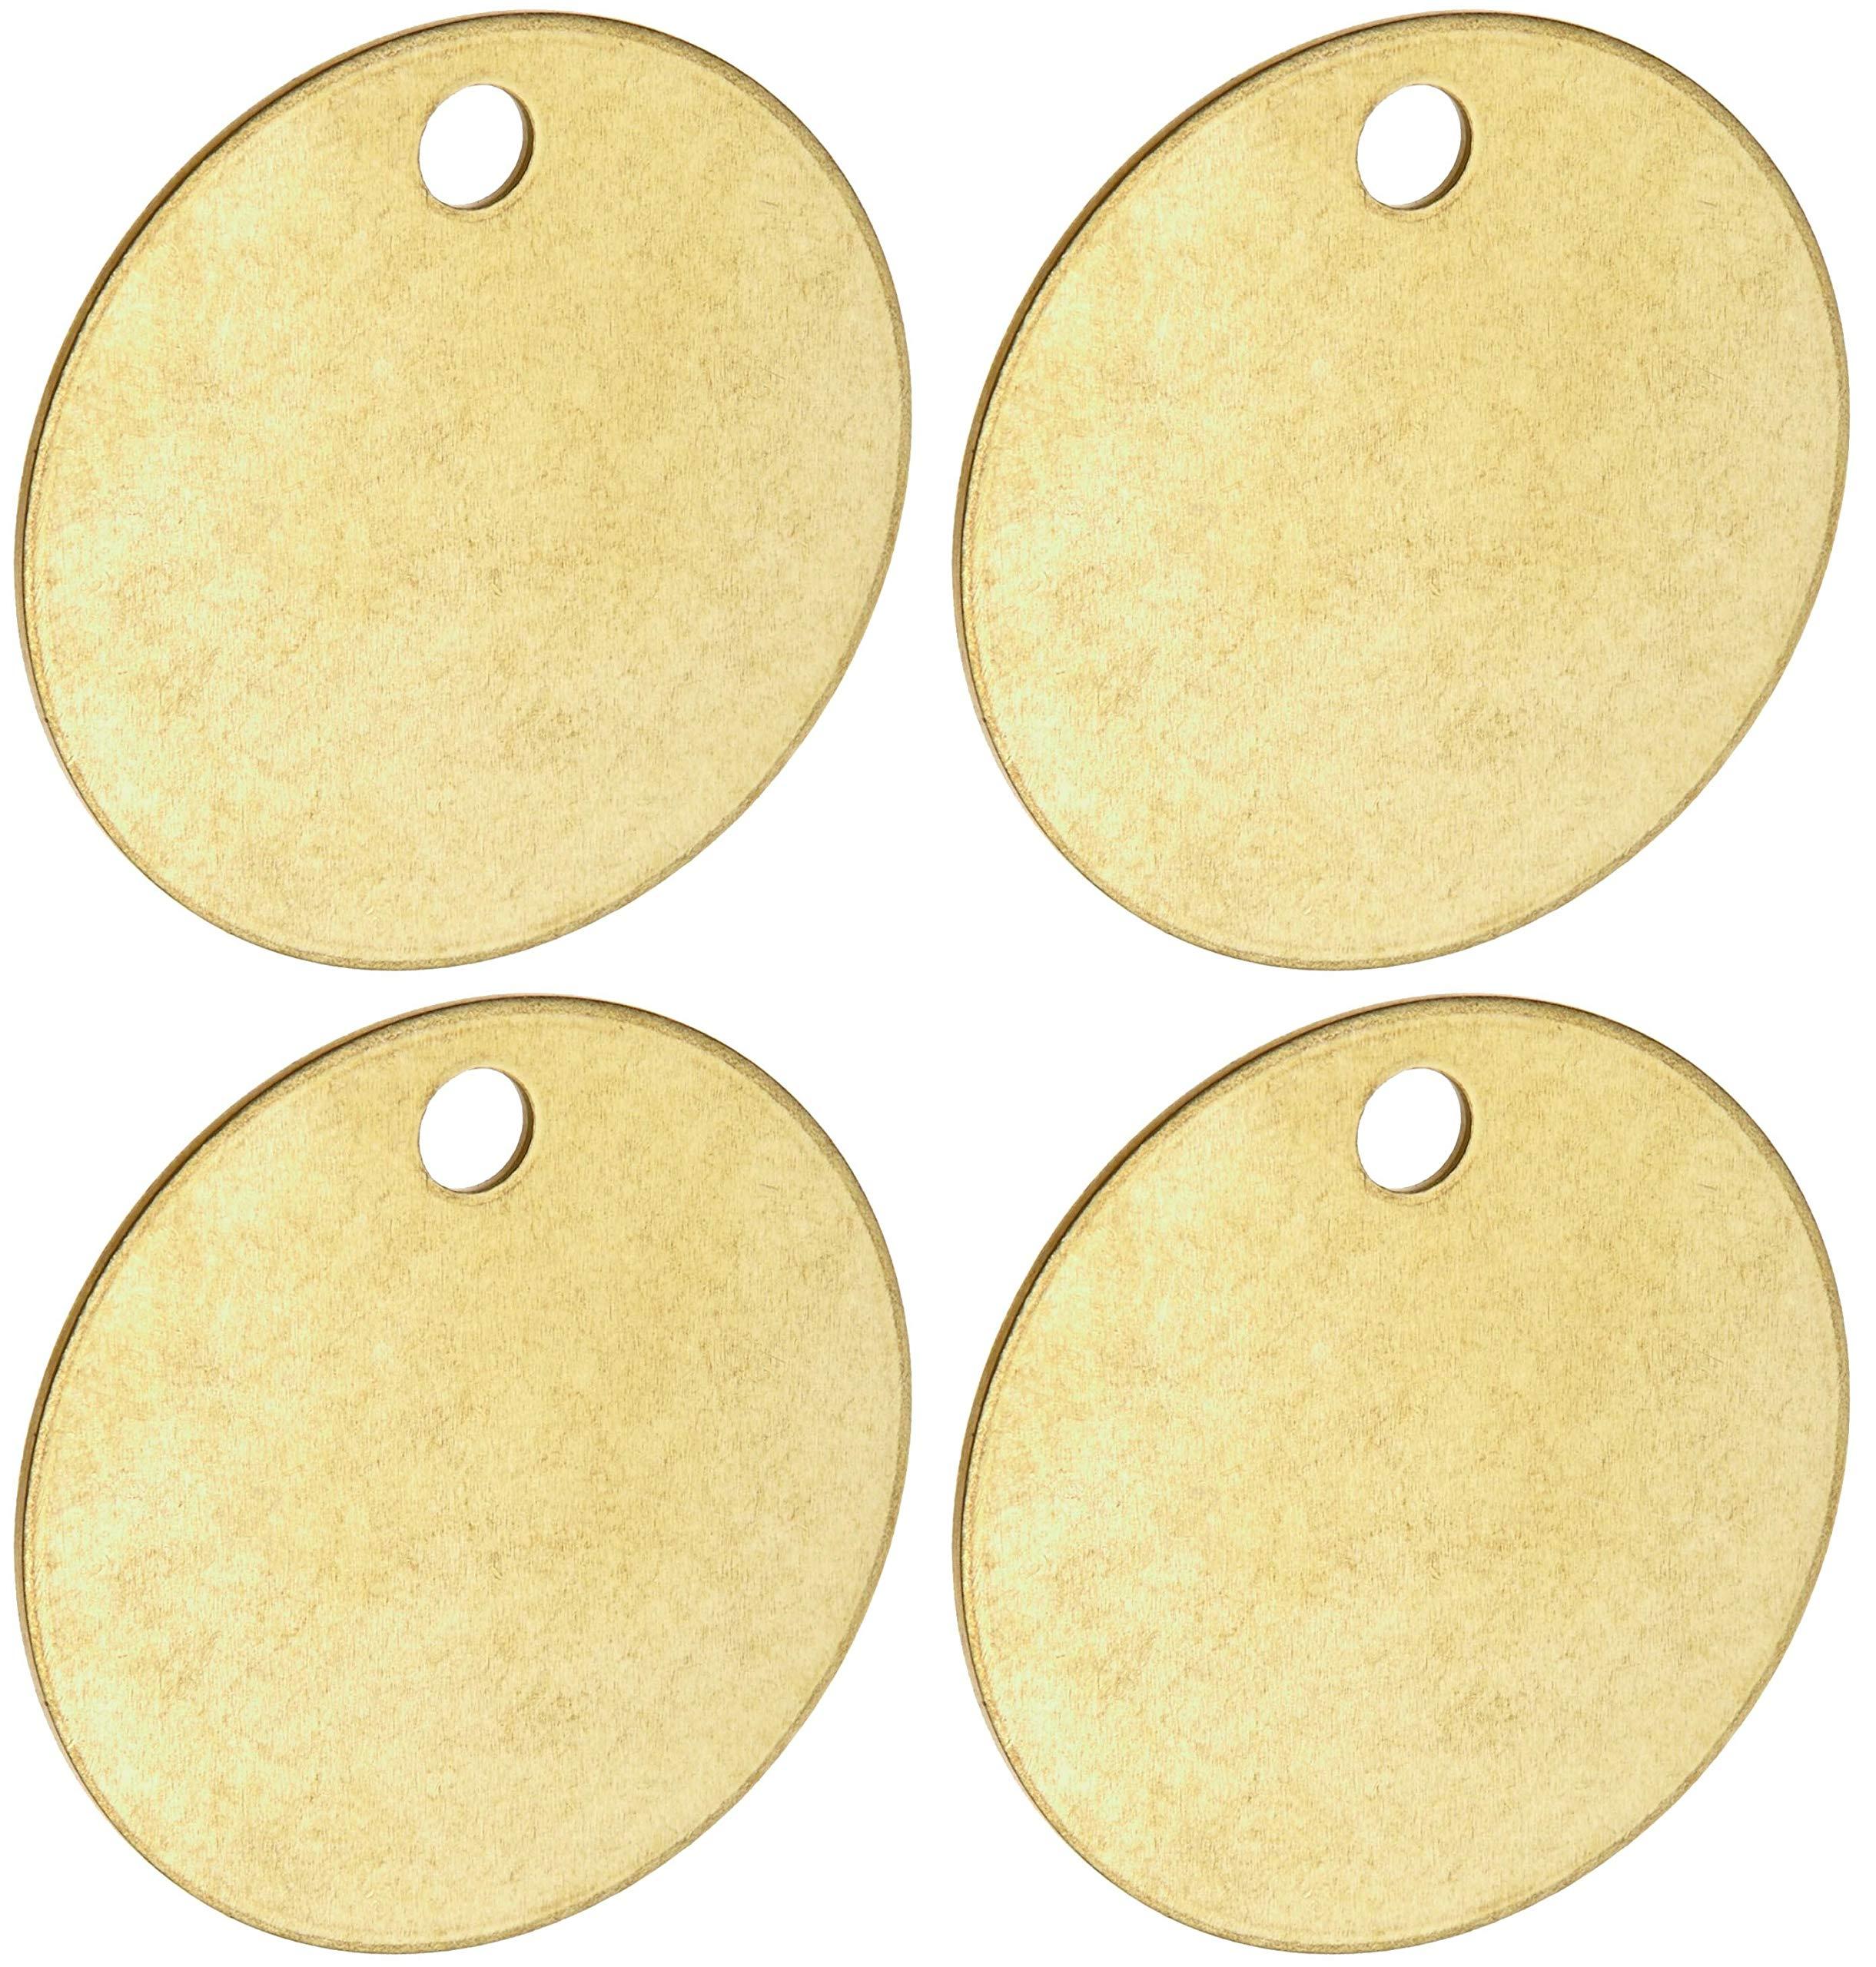 Brady Blank Valve Tags - Round Brass Tags, 1-1/2'' Diameter, B-907 (Pack of 25) - 23210 (Вundlе оf Fоur)